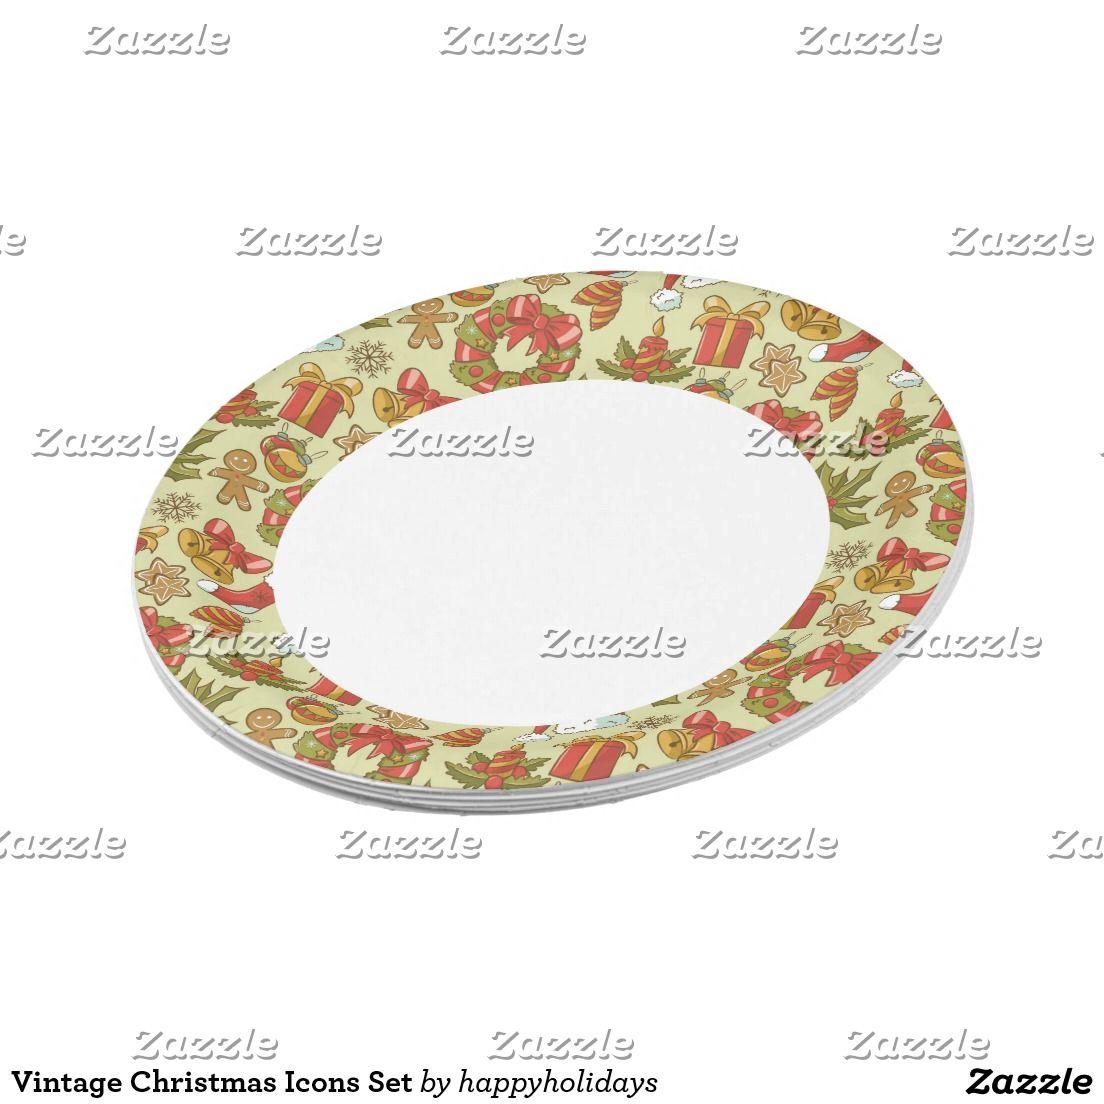 Vintage Christmas Icons Set Paper Plate  sc 1 st  Pinterest & Vintage Christmas Icons Set Paper Plate | Christmas icons Vintage ...